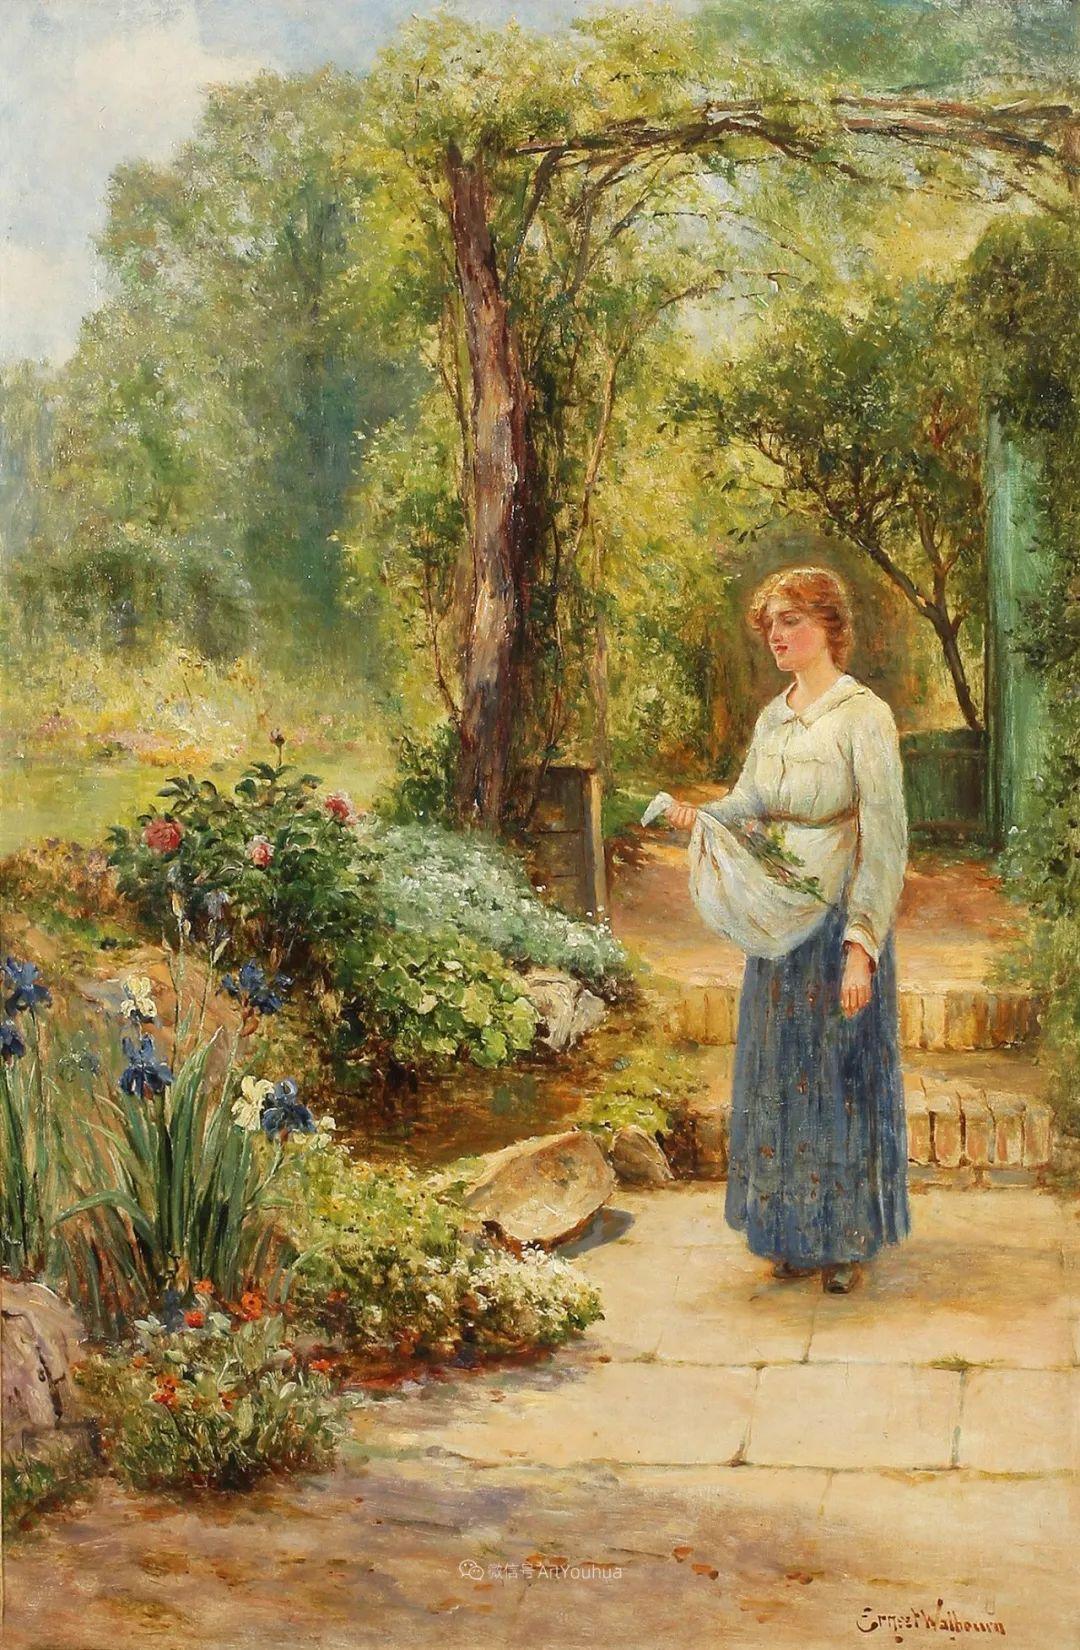 美丽村姑与诗意田园,英国画家Ernest Charles Walbourn作品(下)插图15